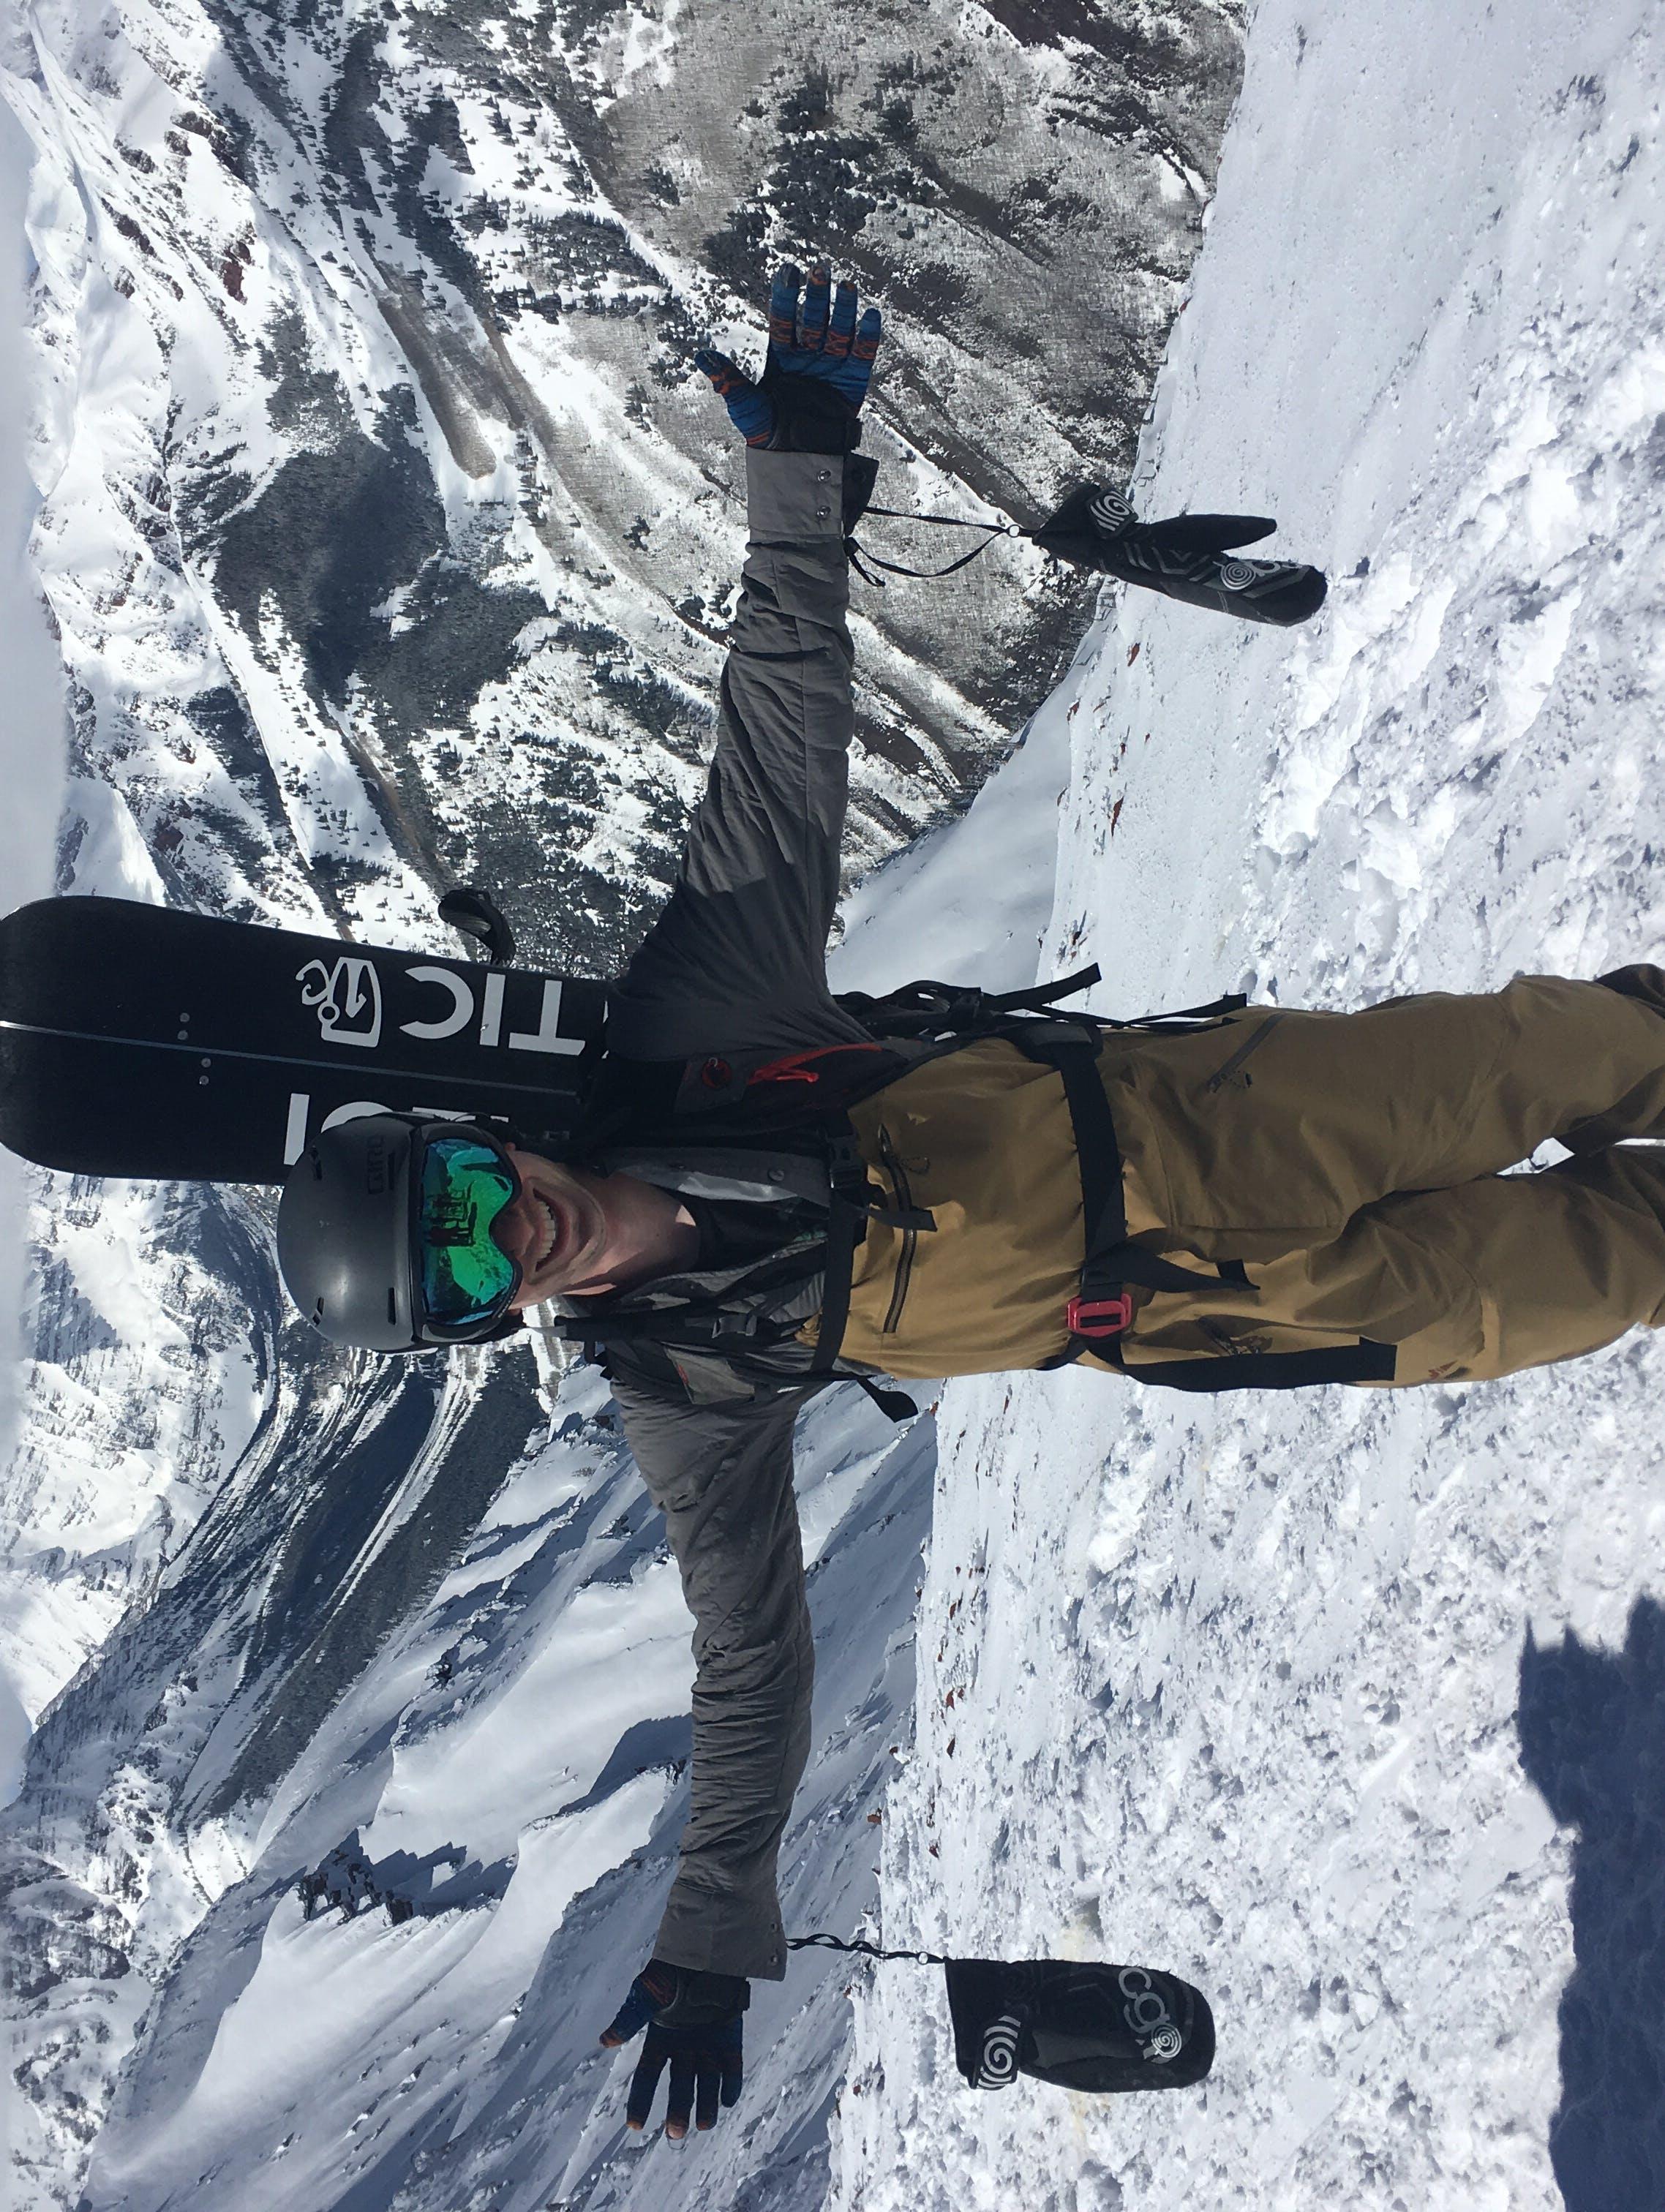 Winter Sports Expert Patrick Bean